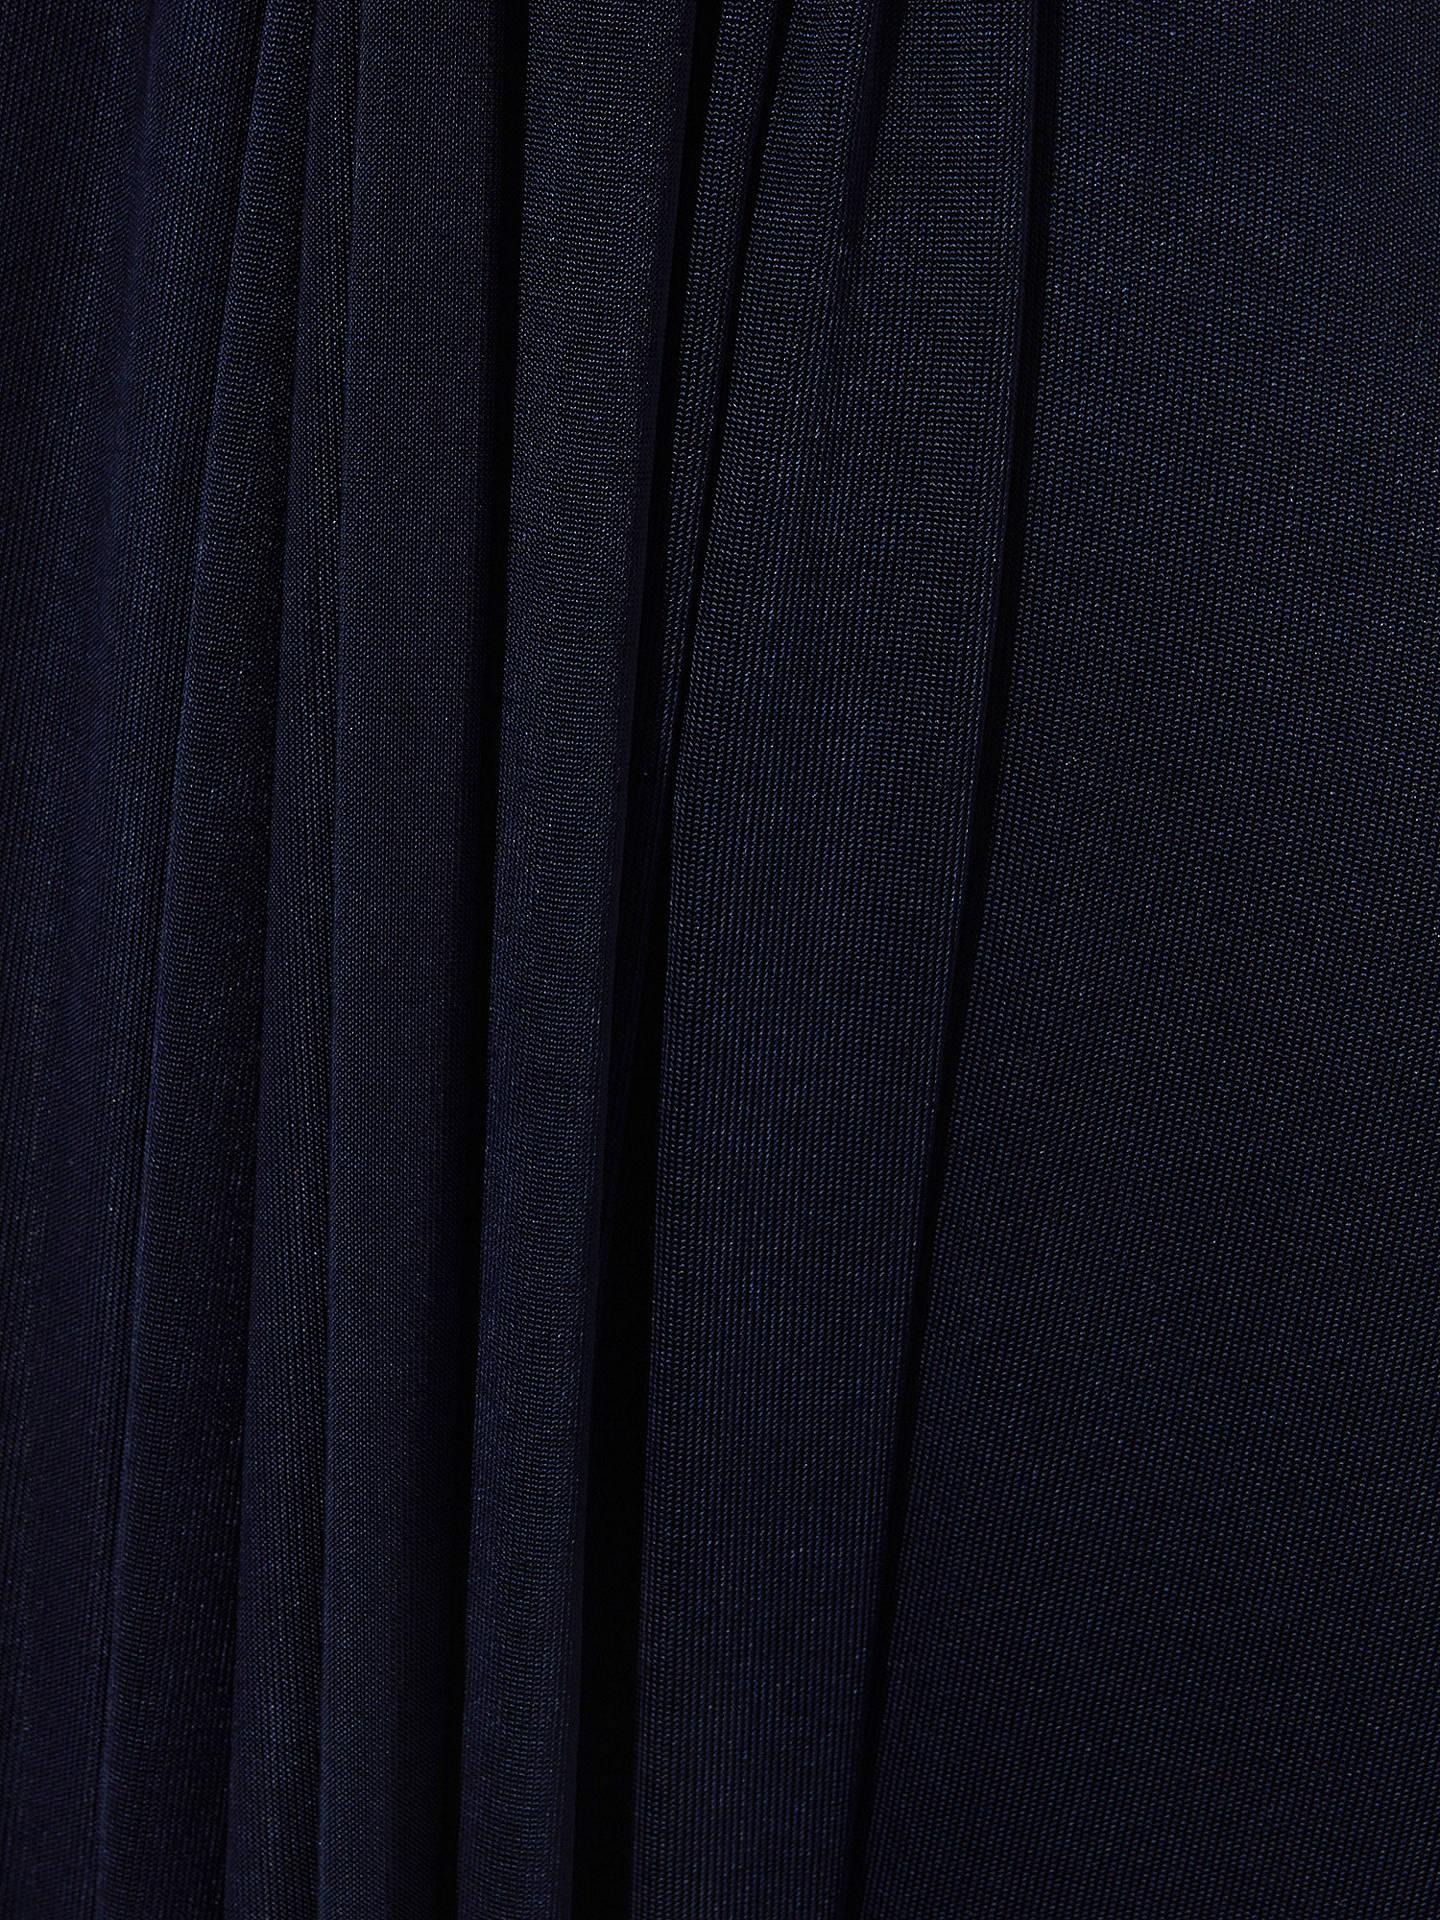 3c6ec28d46 ... Buy Phase Eight Skylar Maxi Dress